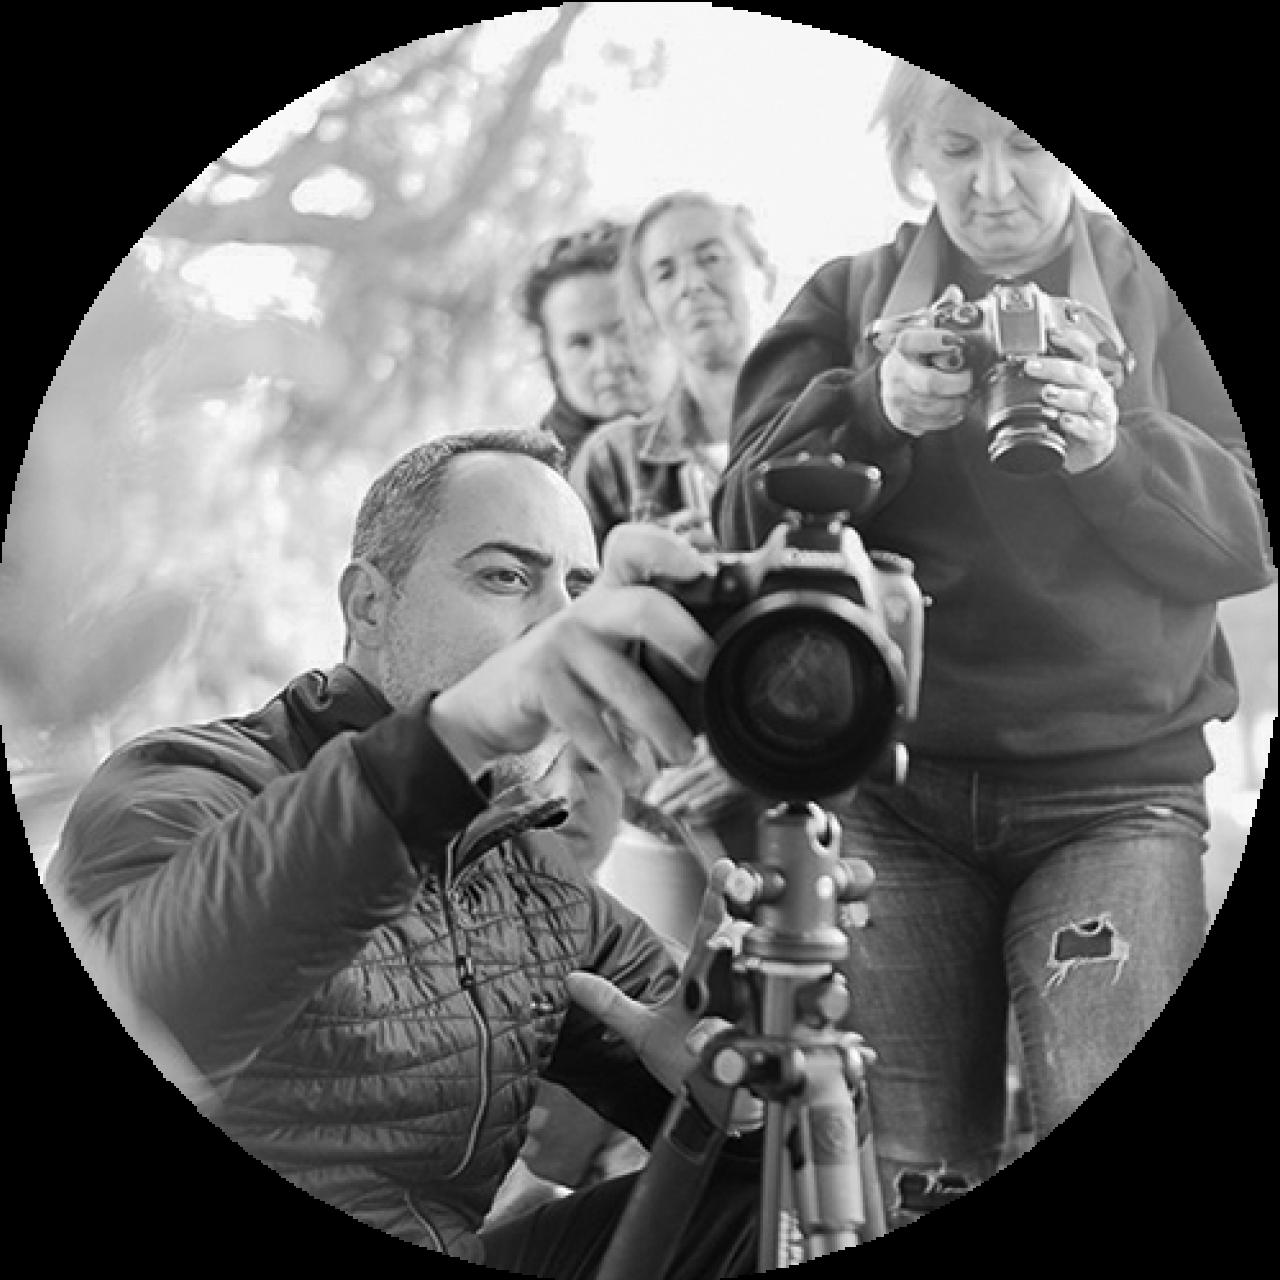 curso-de-iniciacion-a-la-fotografia-de-naturaleza-en-tenerife-con-oliver-yanes